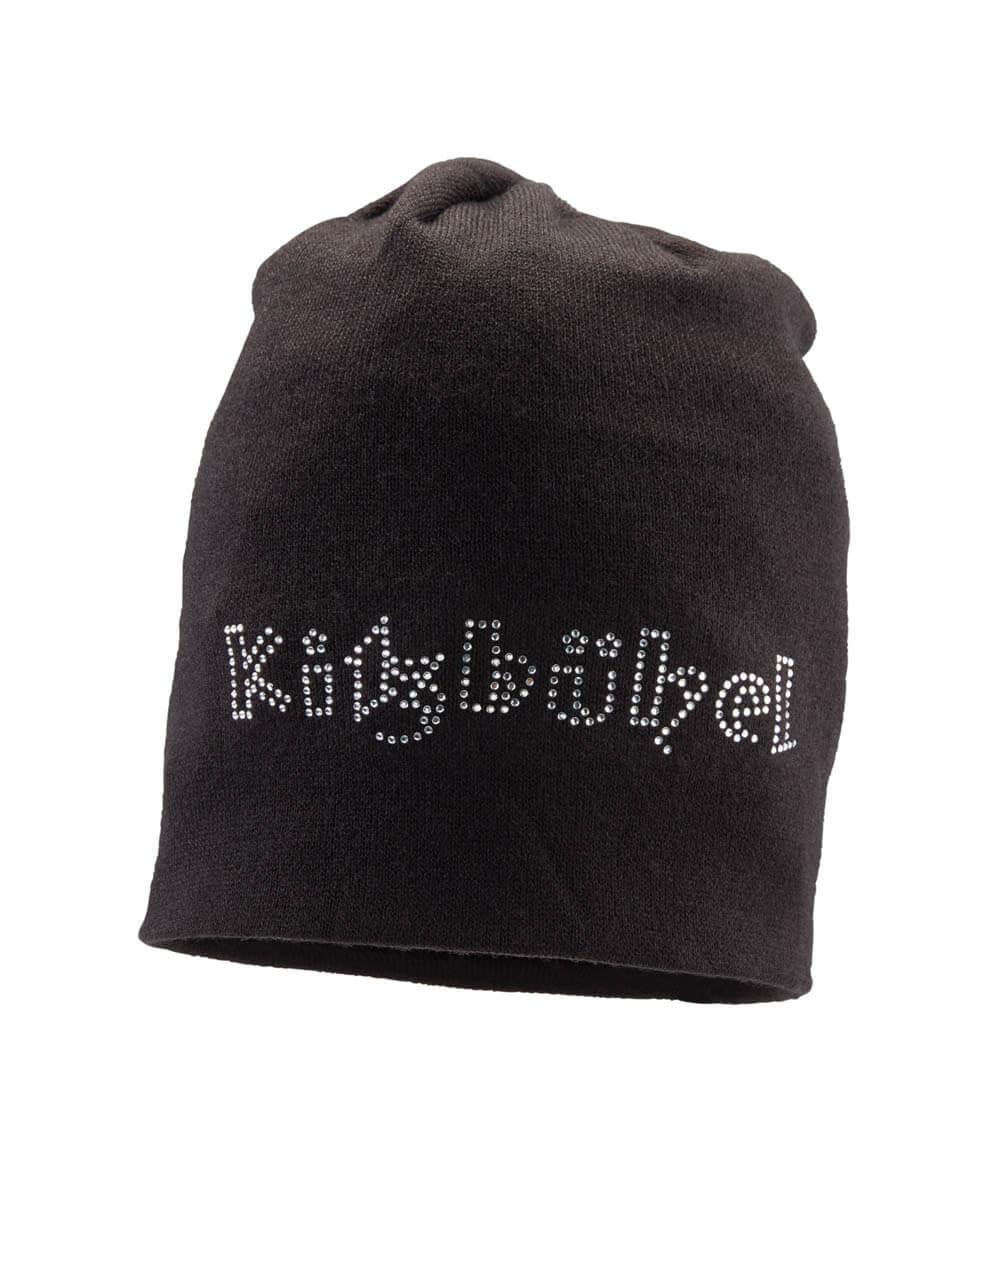 701236010 Damen Mütze schwarz glitzer